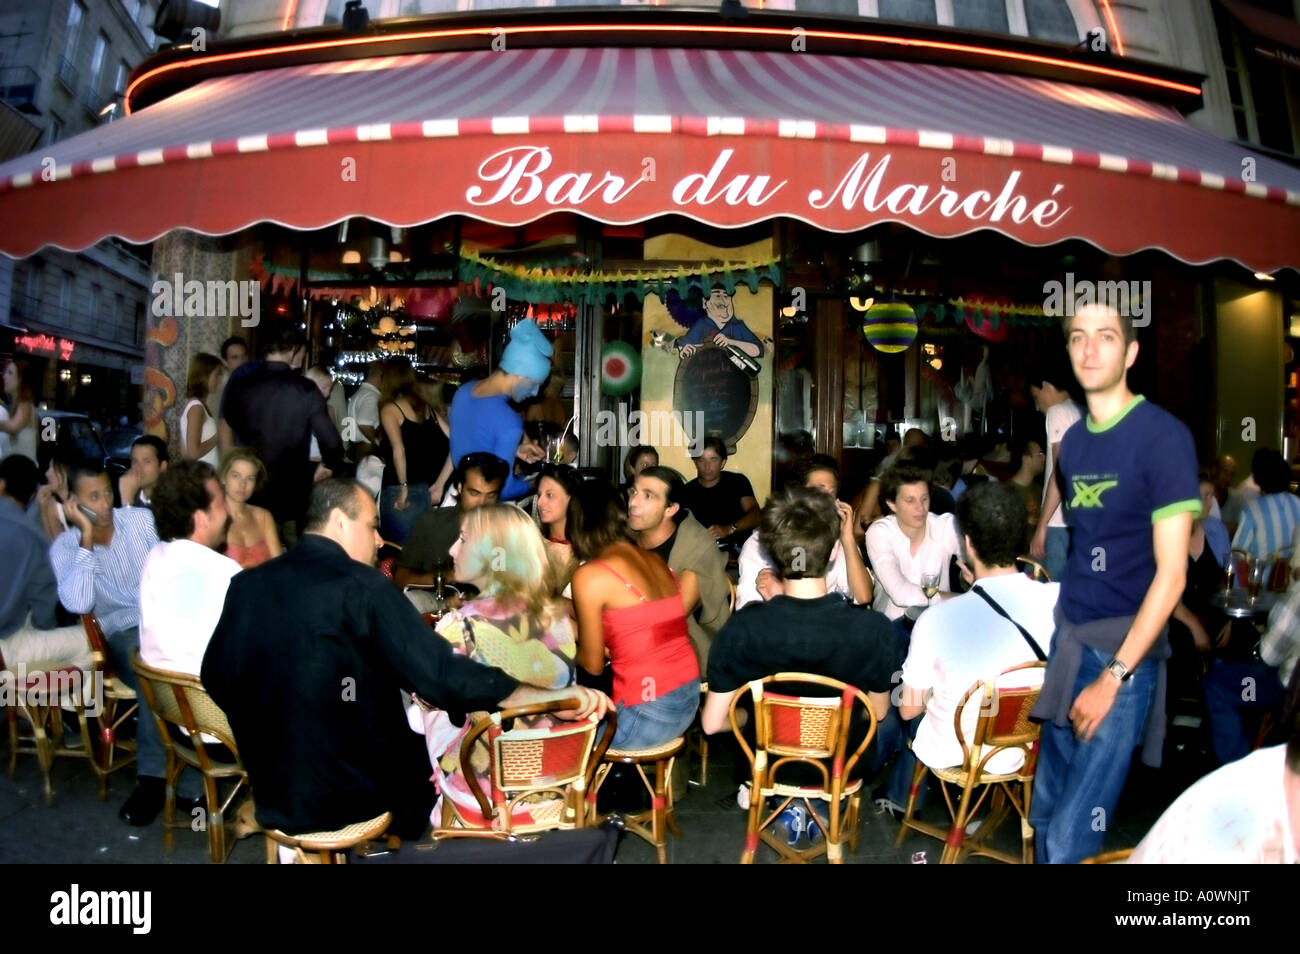 PARIS, France, Crowd People Sharing Drinks on Sidewalk Terrace Paris Café Bar Bistro Restaurant in Latin Quarter - Stock Image